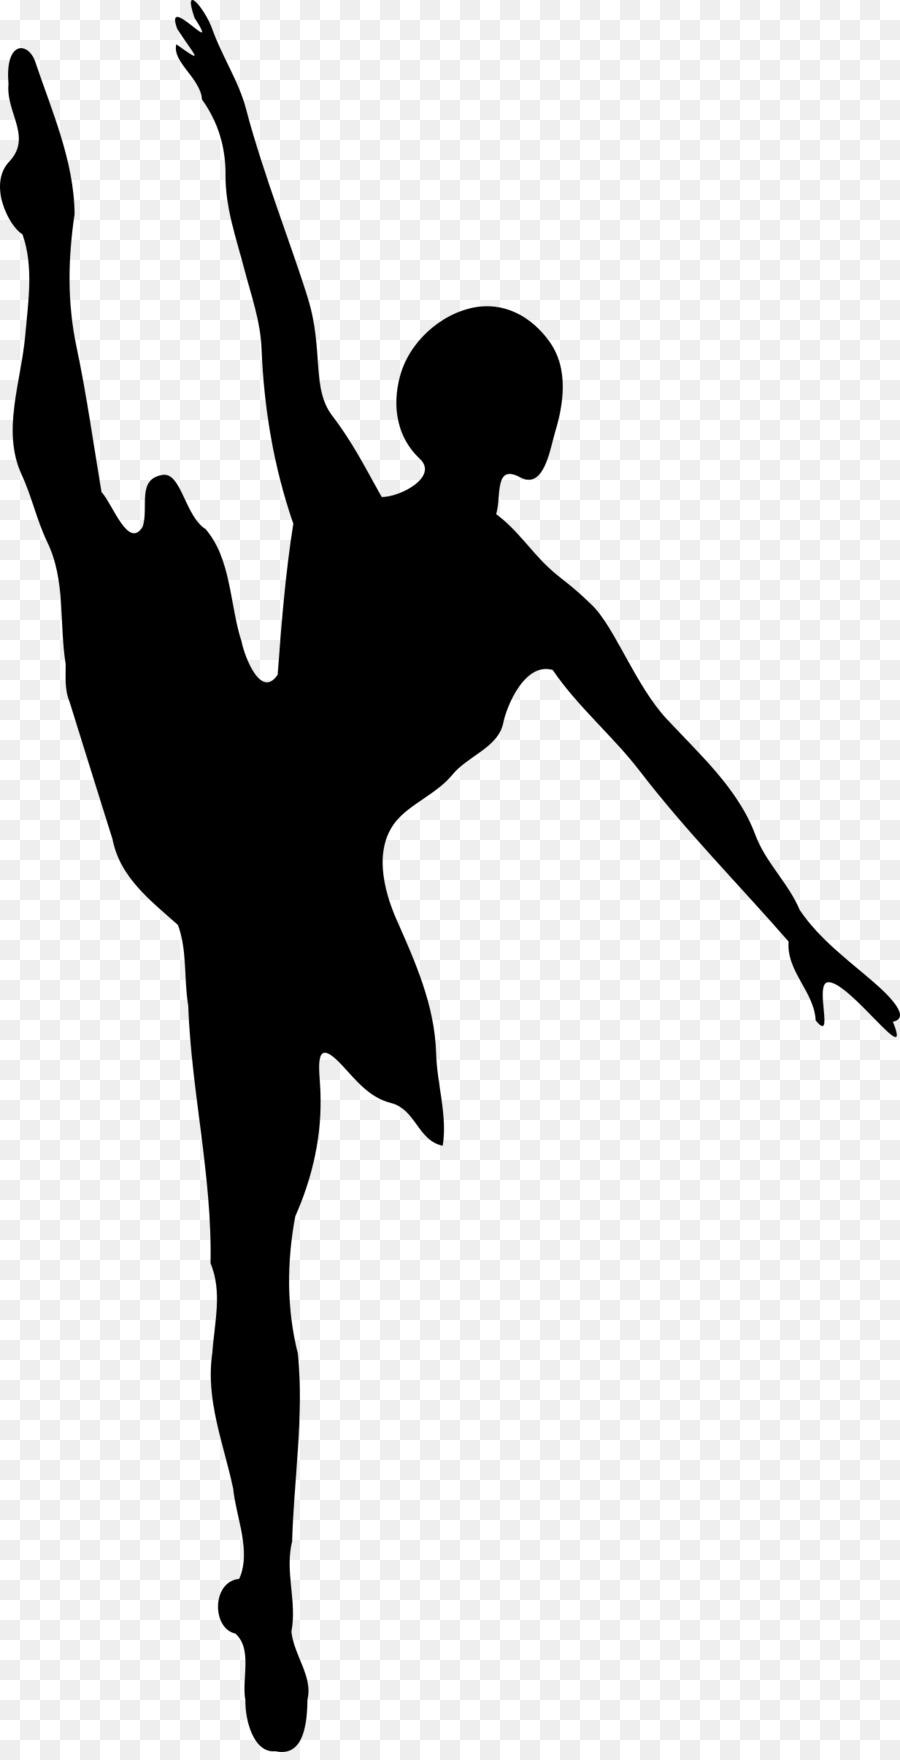 free dance ballet dancer clip art dance png download 1233 2400 rh kisspng com free ballerina silhouette clipart